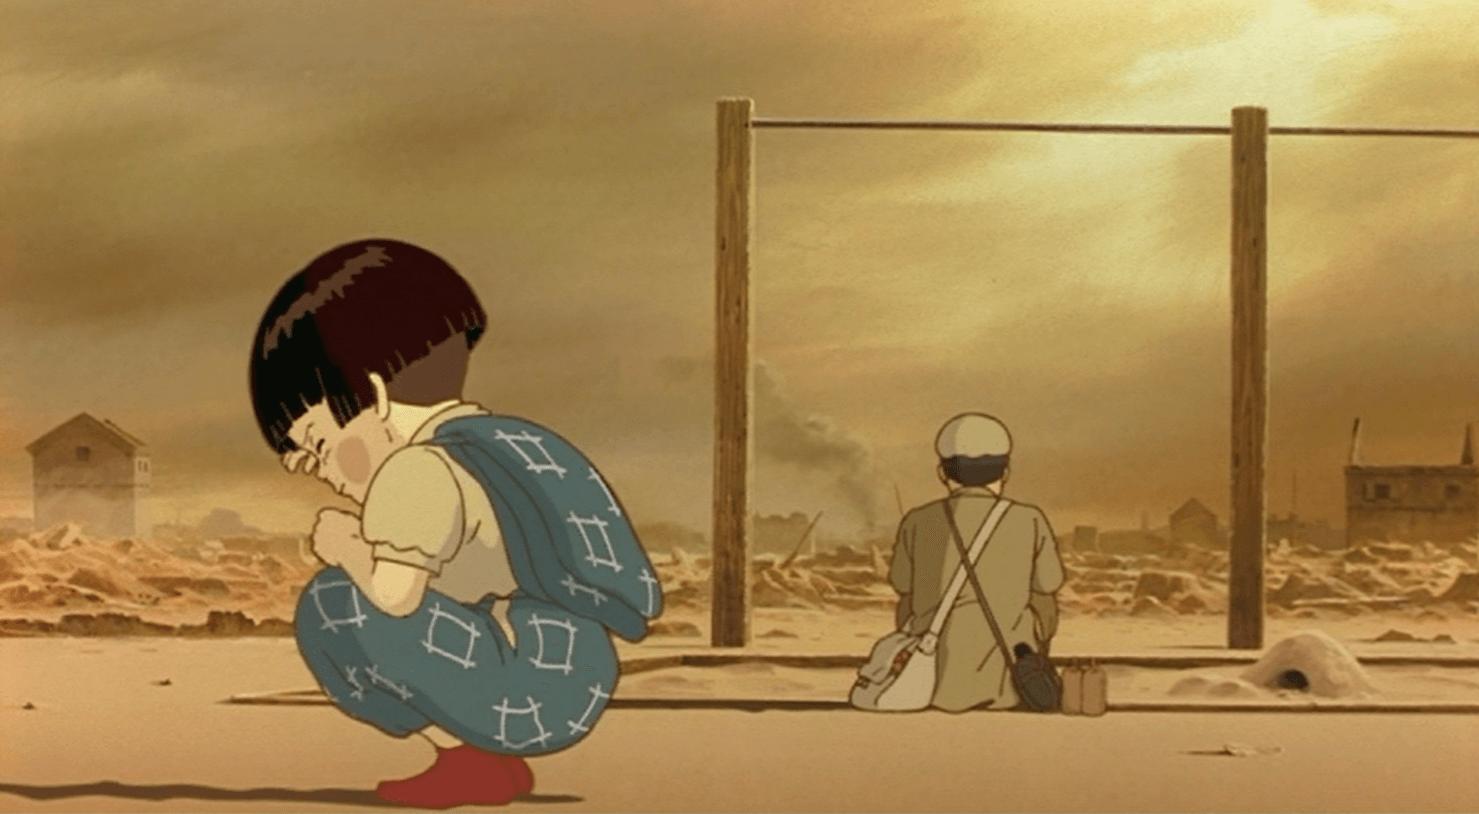 The Destruction of Japan